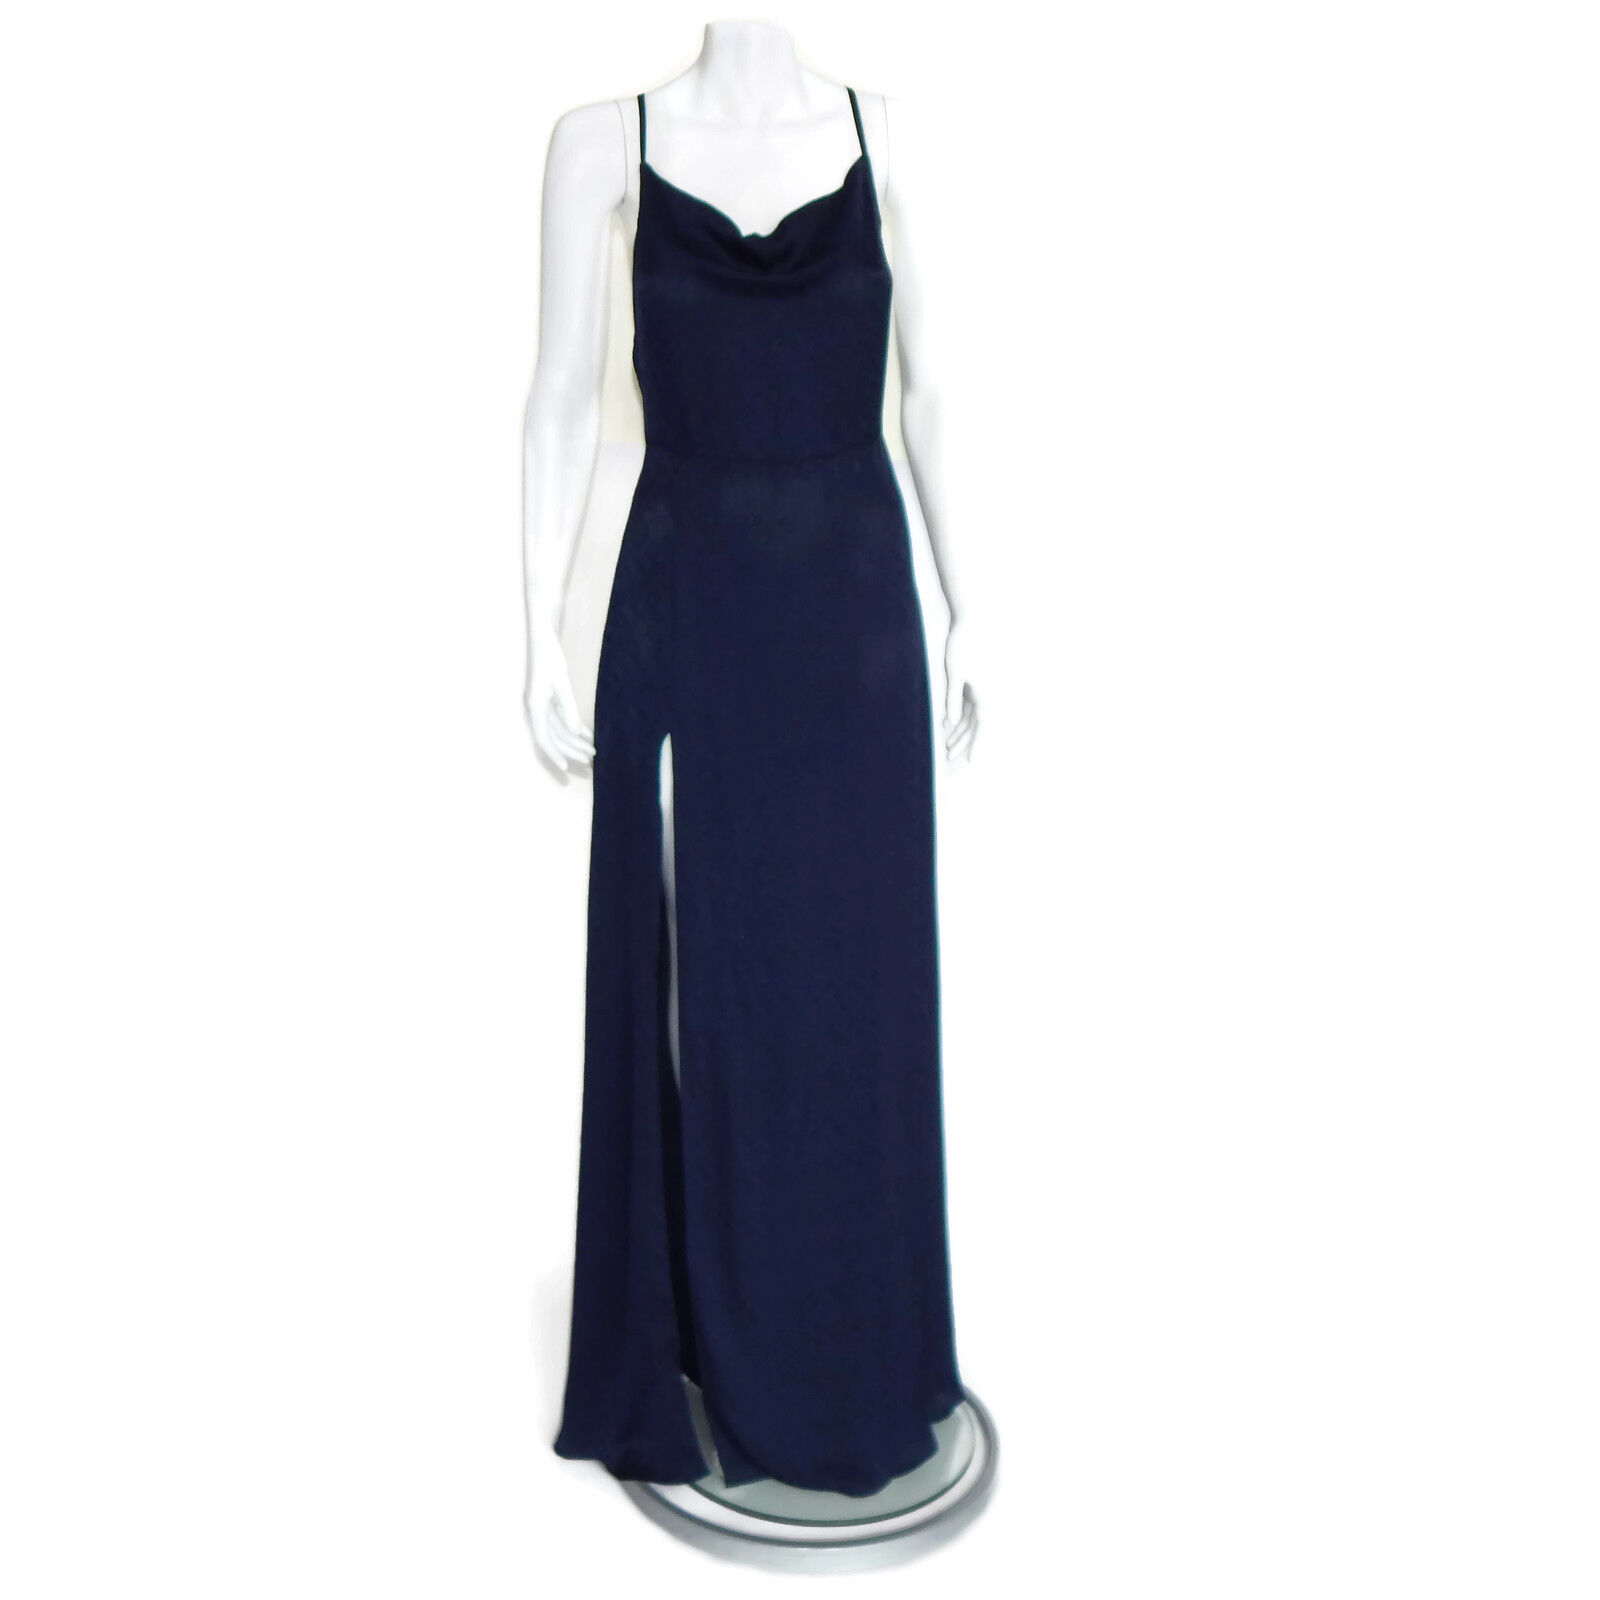 REFORMATION New Terraza Dark bluee Maxi Dress High High High Side Slit  248 Straps size 8 9edf3b